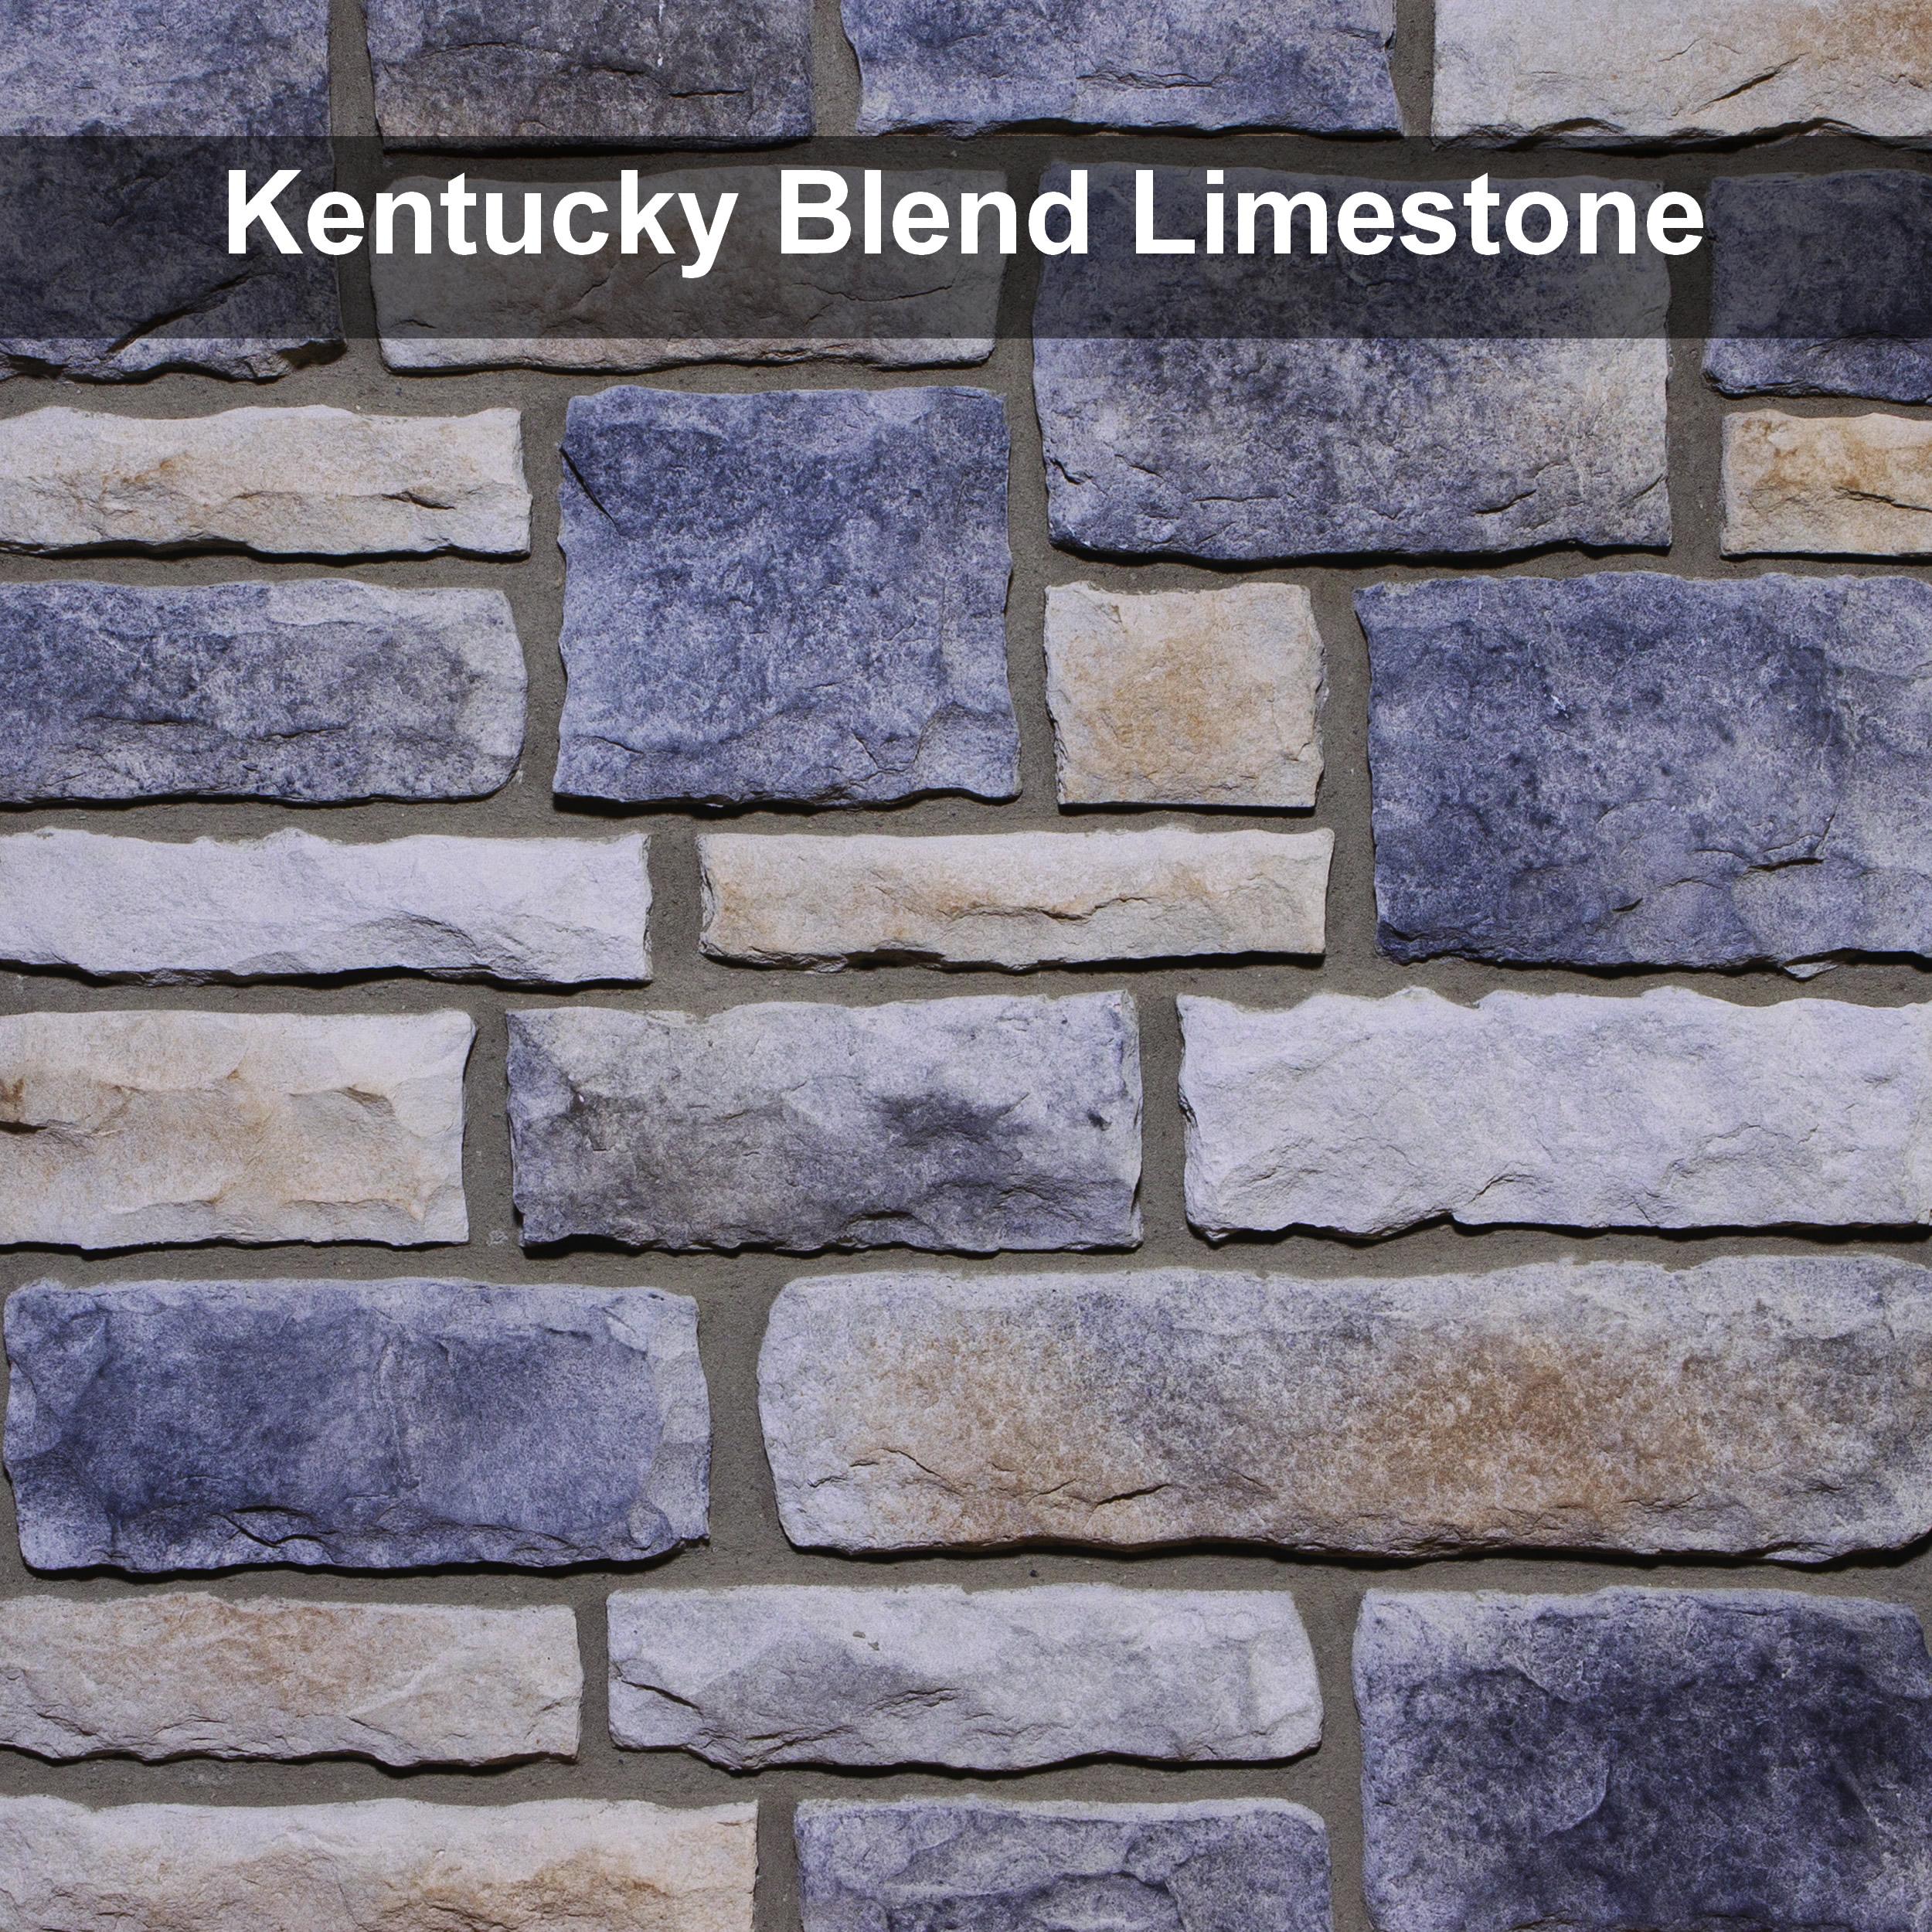 DQ_Limestone_Kentucky Blend_Profile.jpg